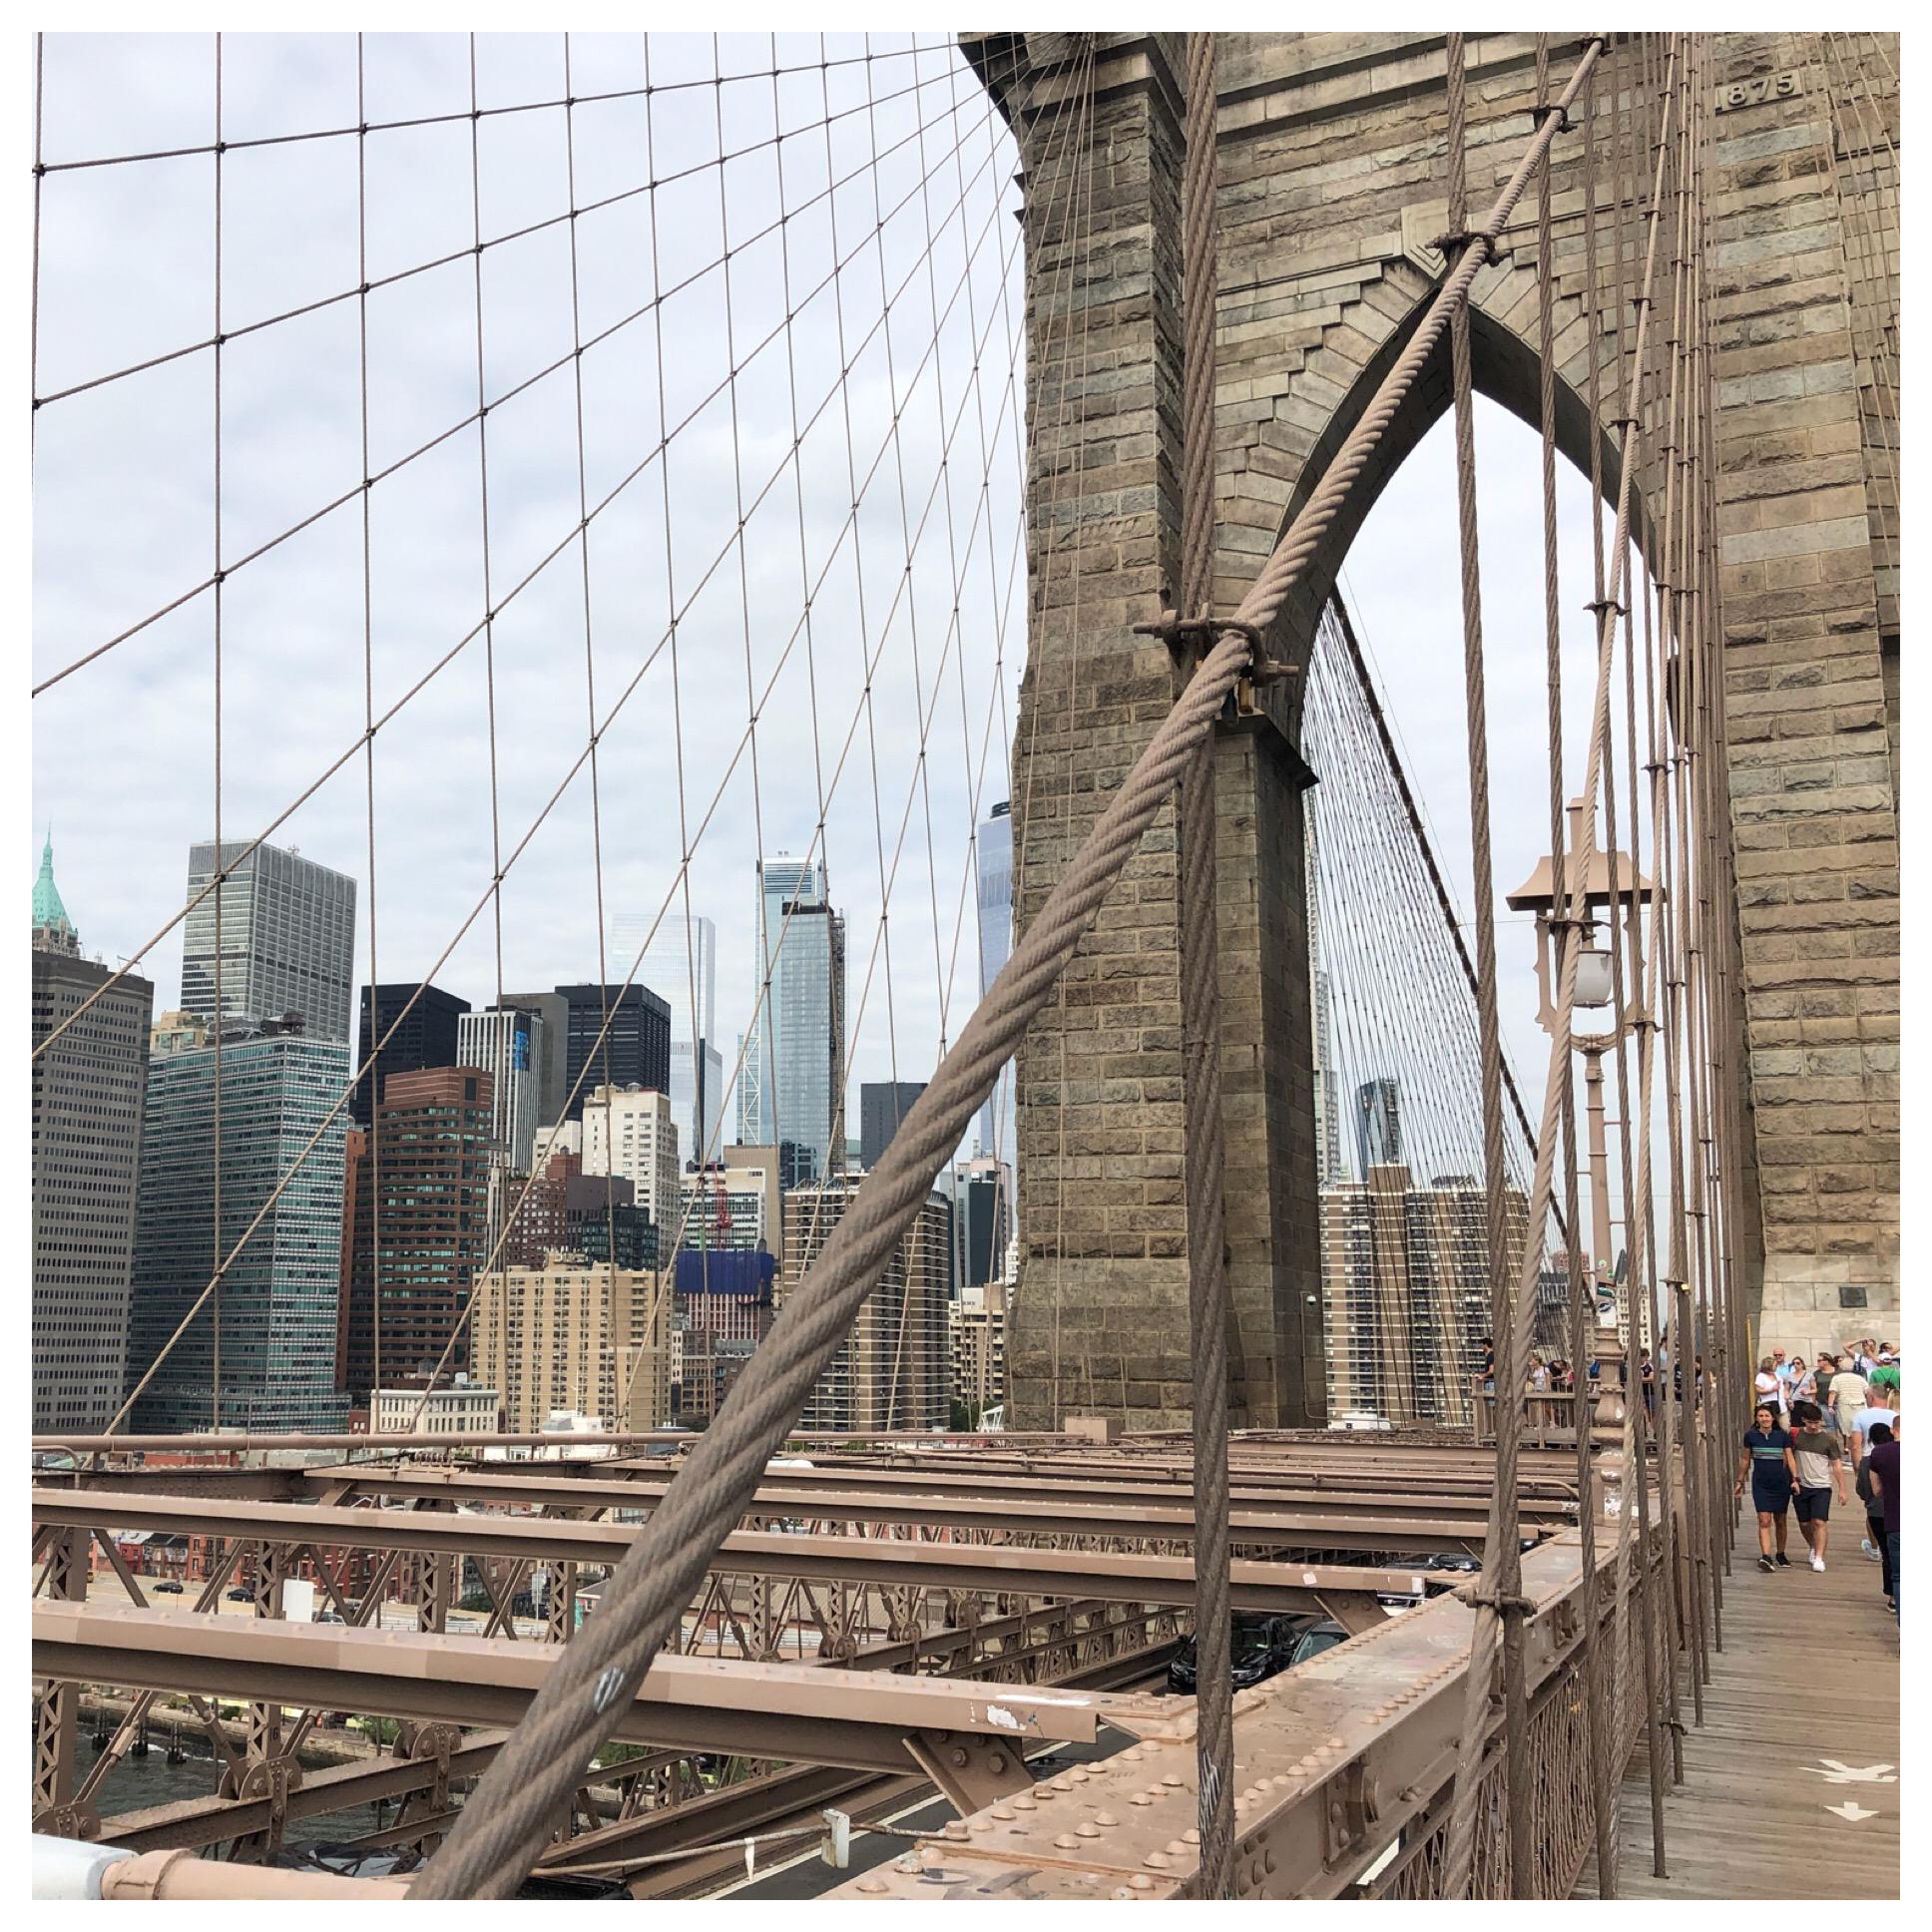 View of Manhattan from the Brooklyn Bridge.